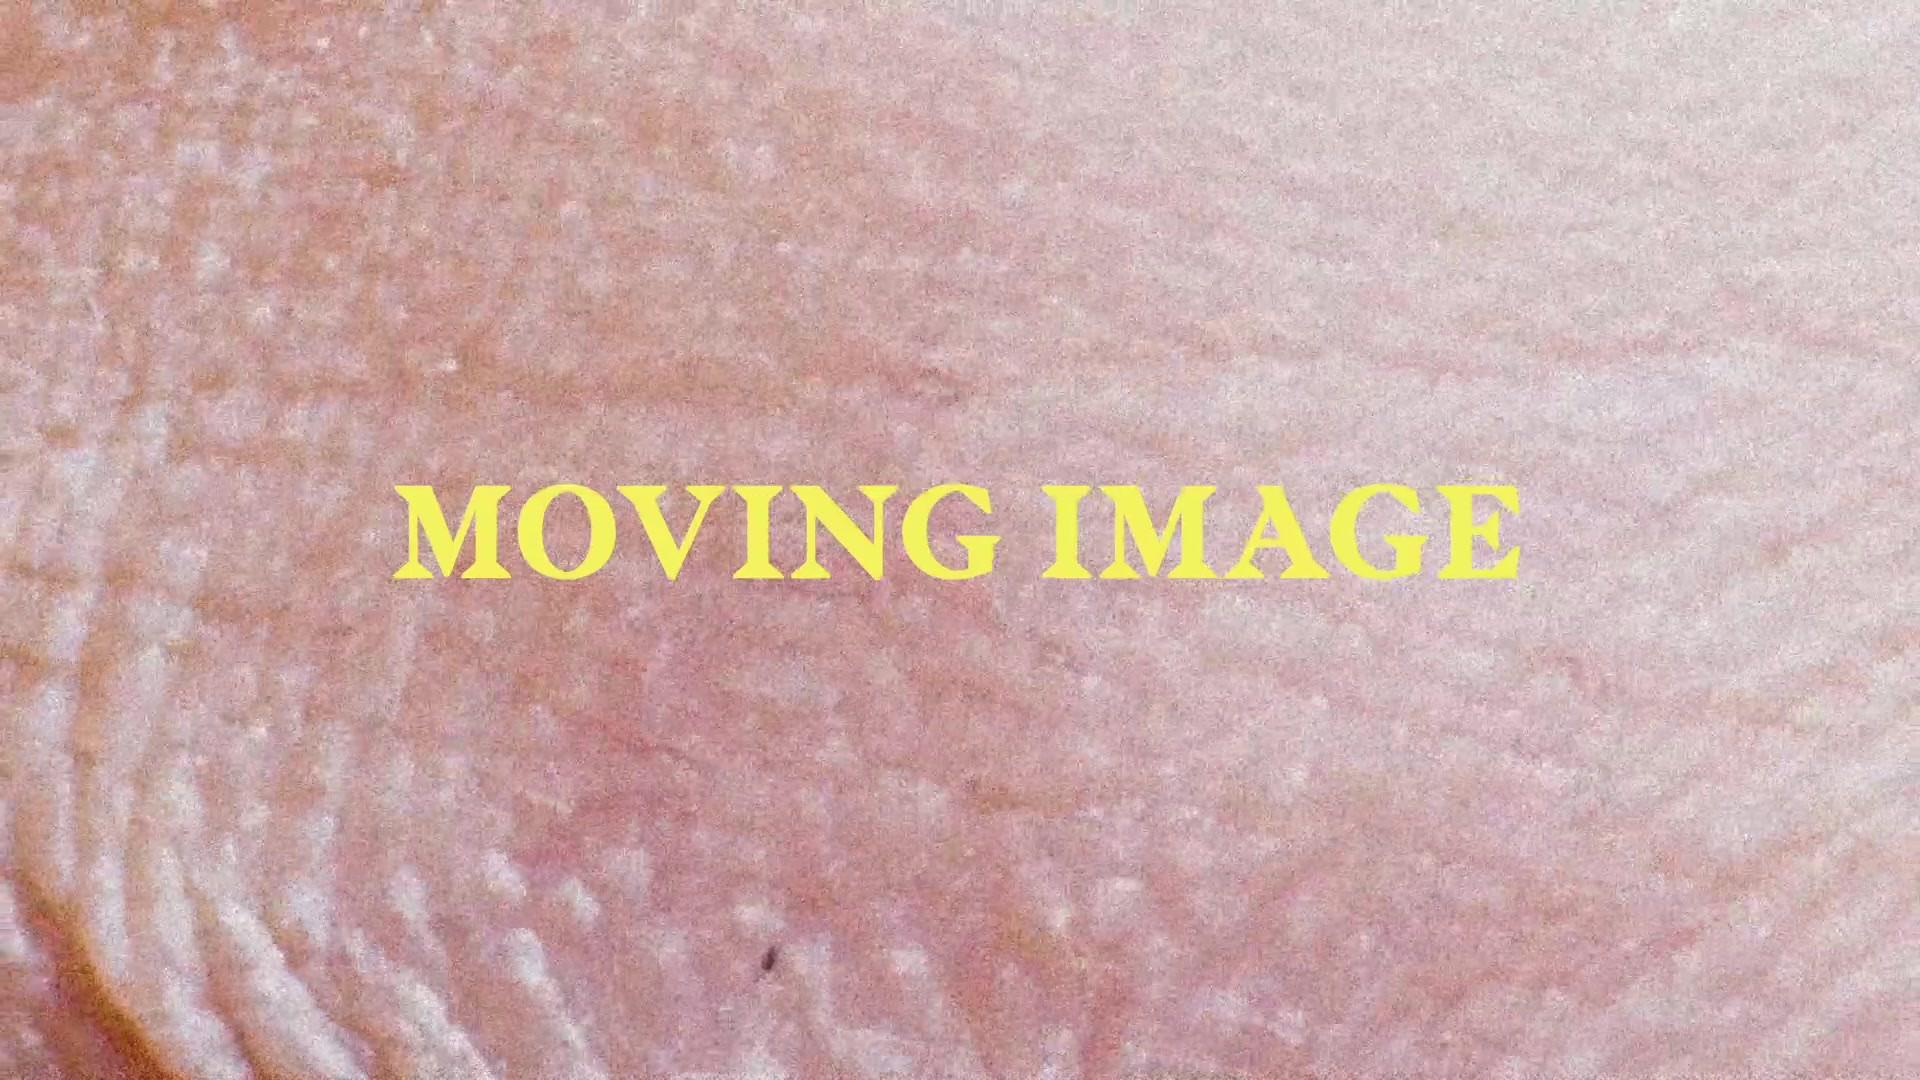 MOVING IMAGE HEADER.mp4